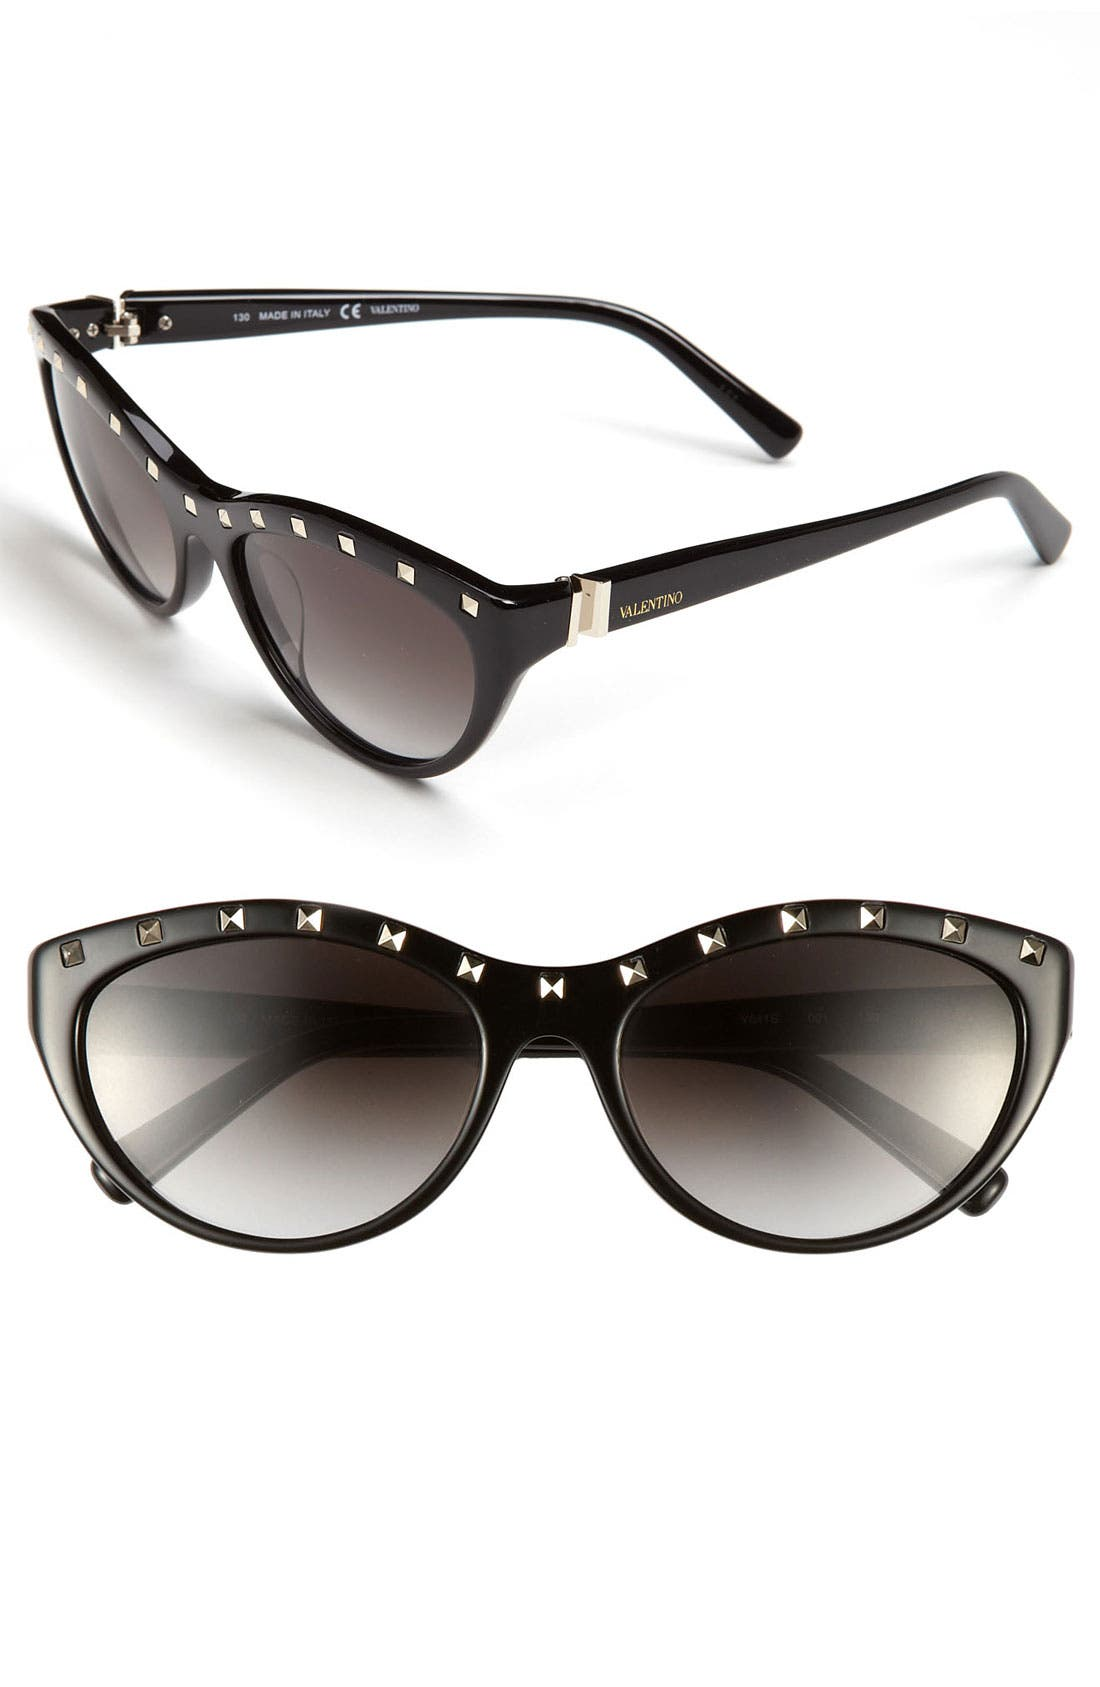 Main Image - Valentino 'Rockstud' 54mm Cat Eye Sunglasses